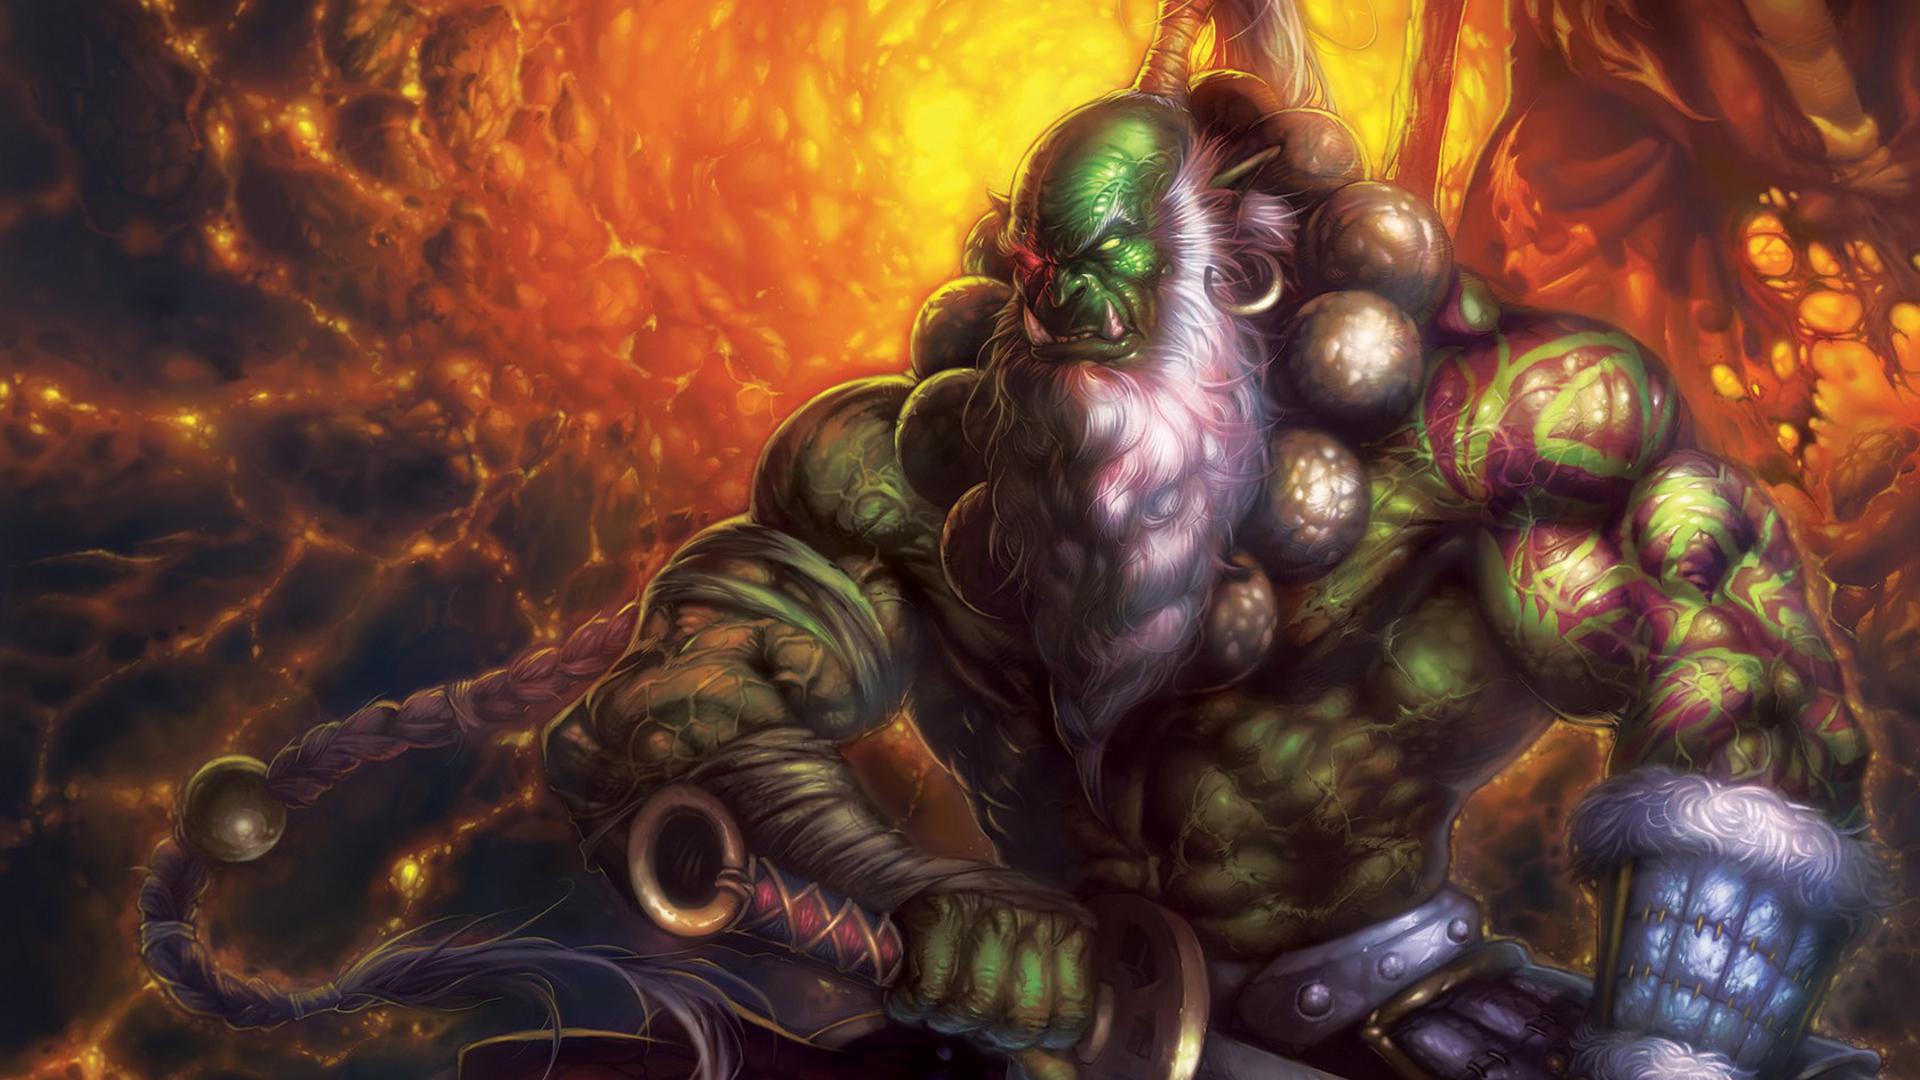 Blood Elf World Warcraft Wallpaper 4k